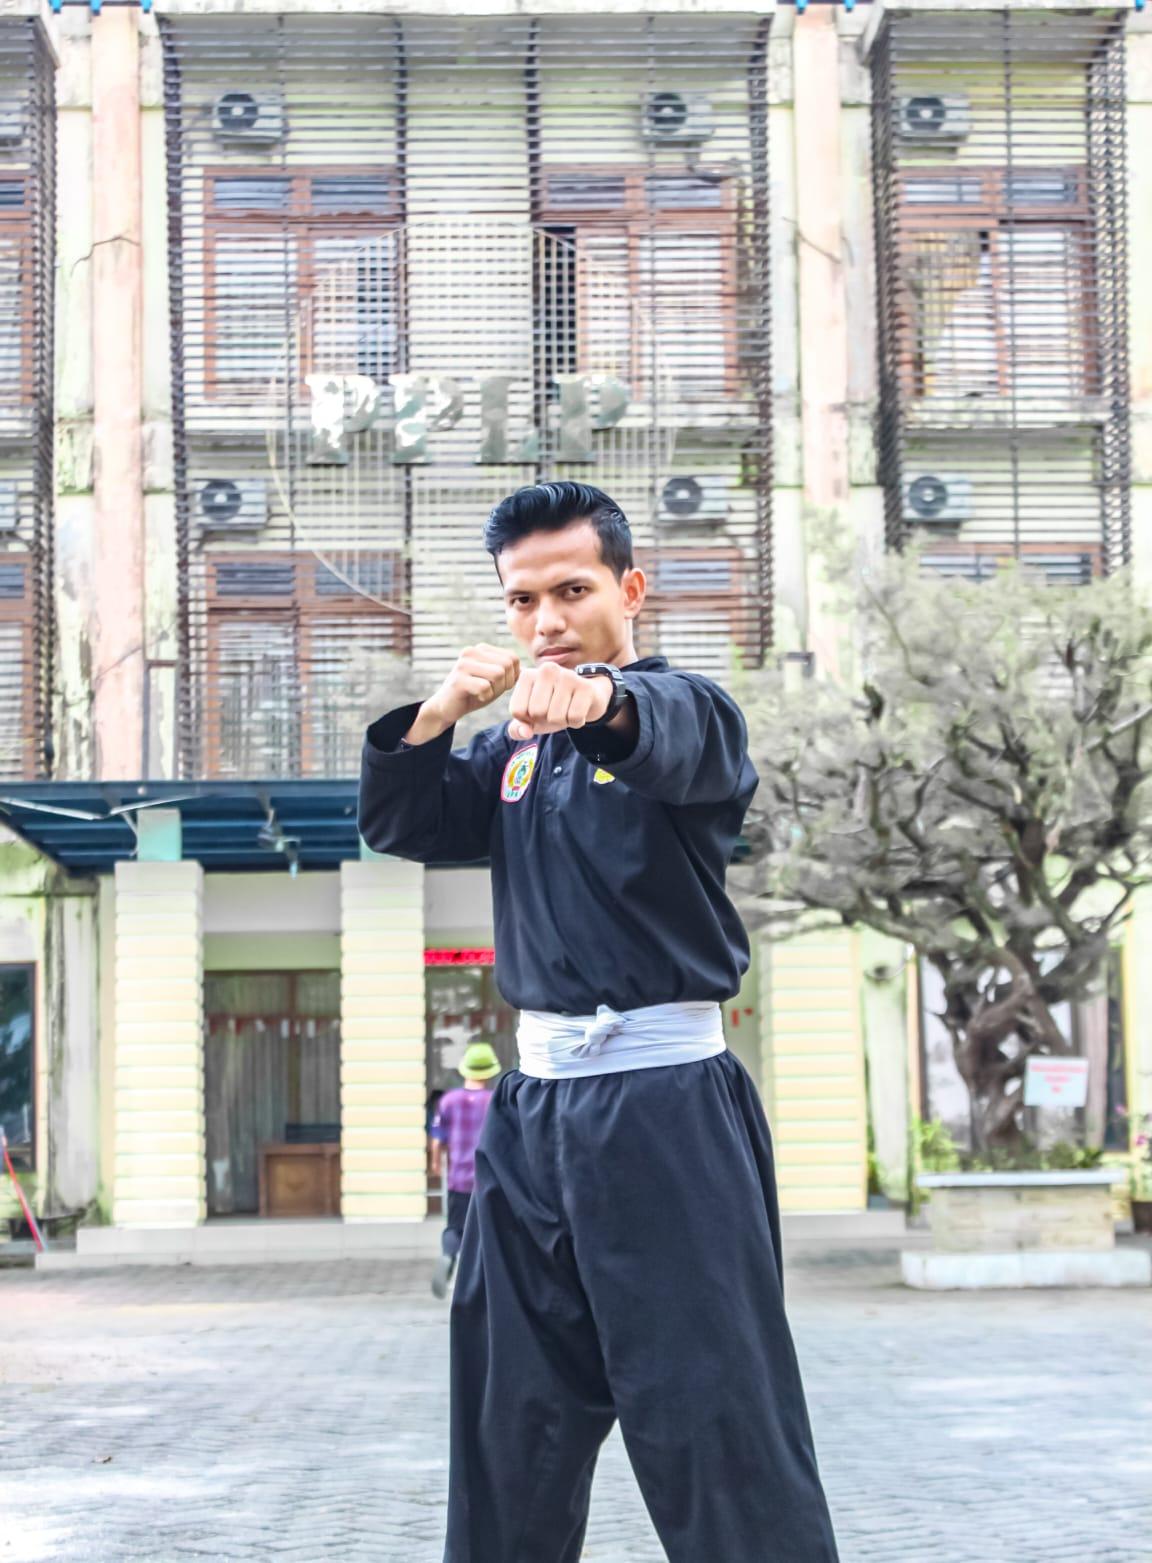 Frenko Ginting Atelt Pencak Silat Asal Kota Binjai